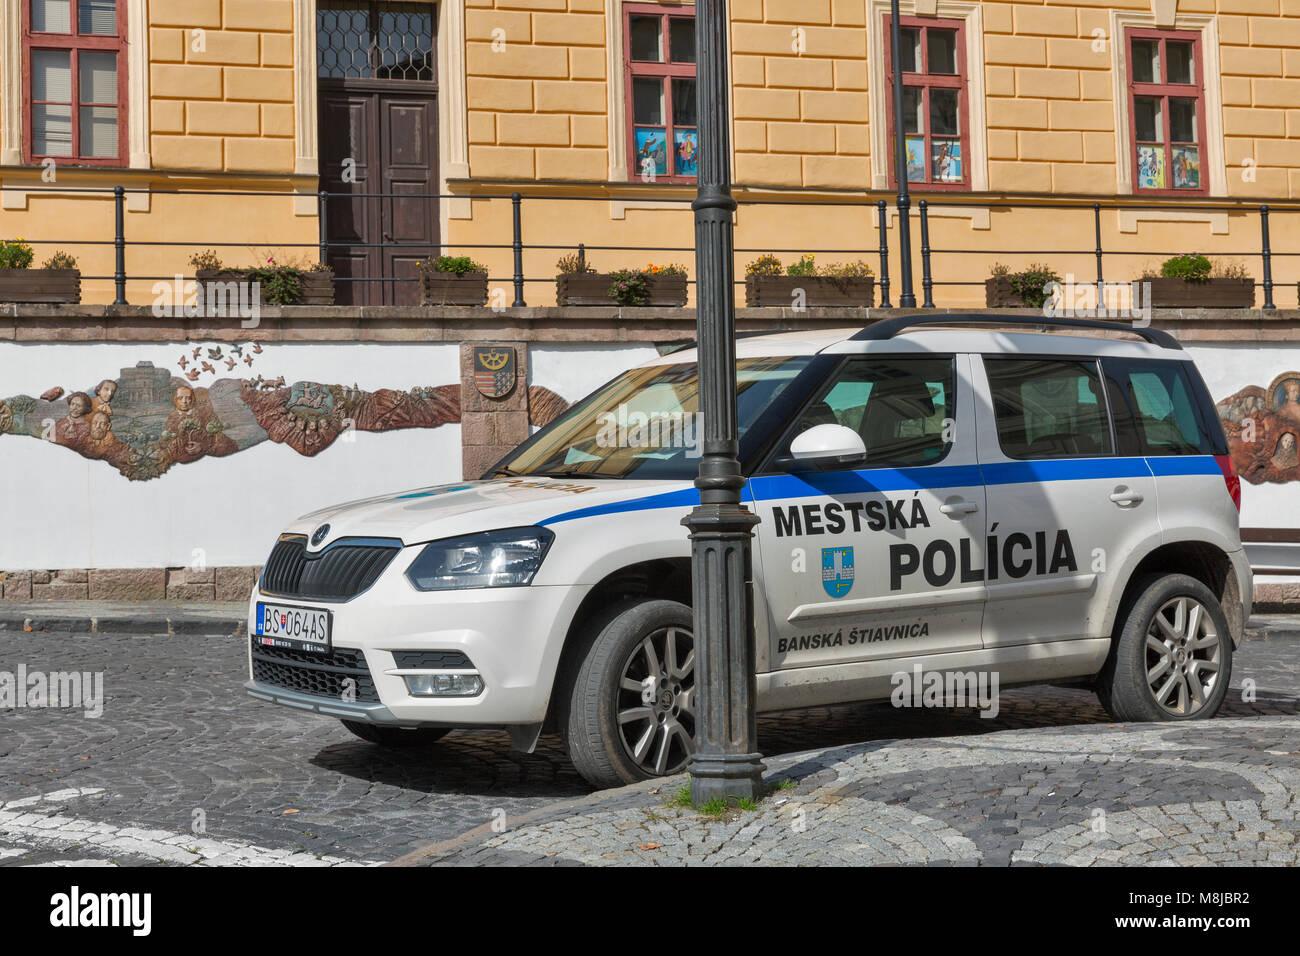 Skoda au service de la police - Page 7 Banska-stiavnica-slovakia-september-27-2017-municipal-police-car-parked-M8JBR2